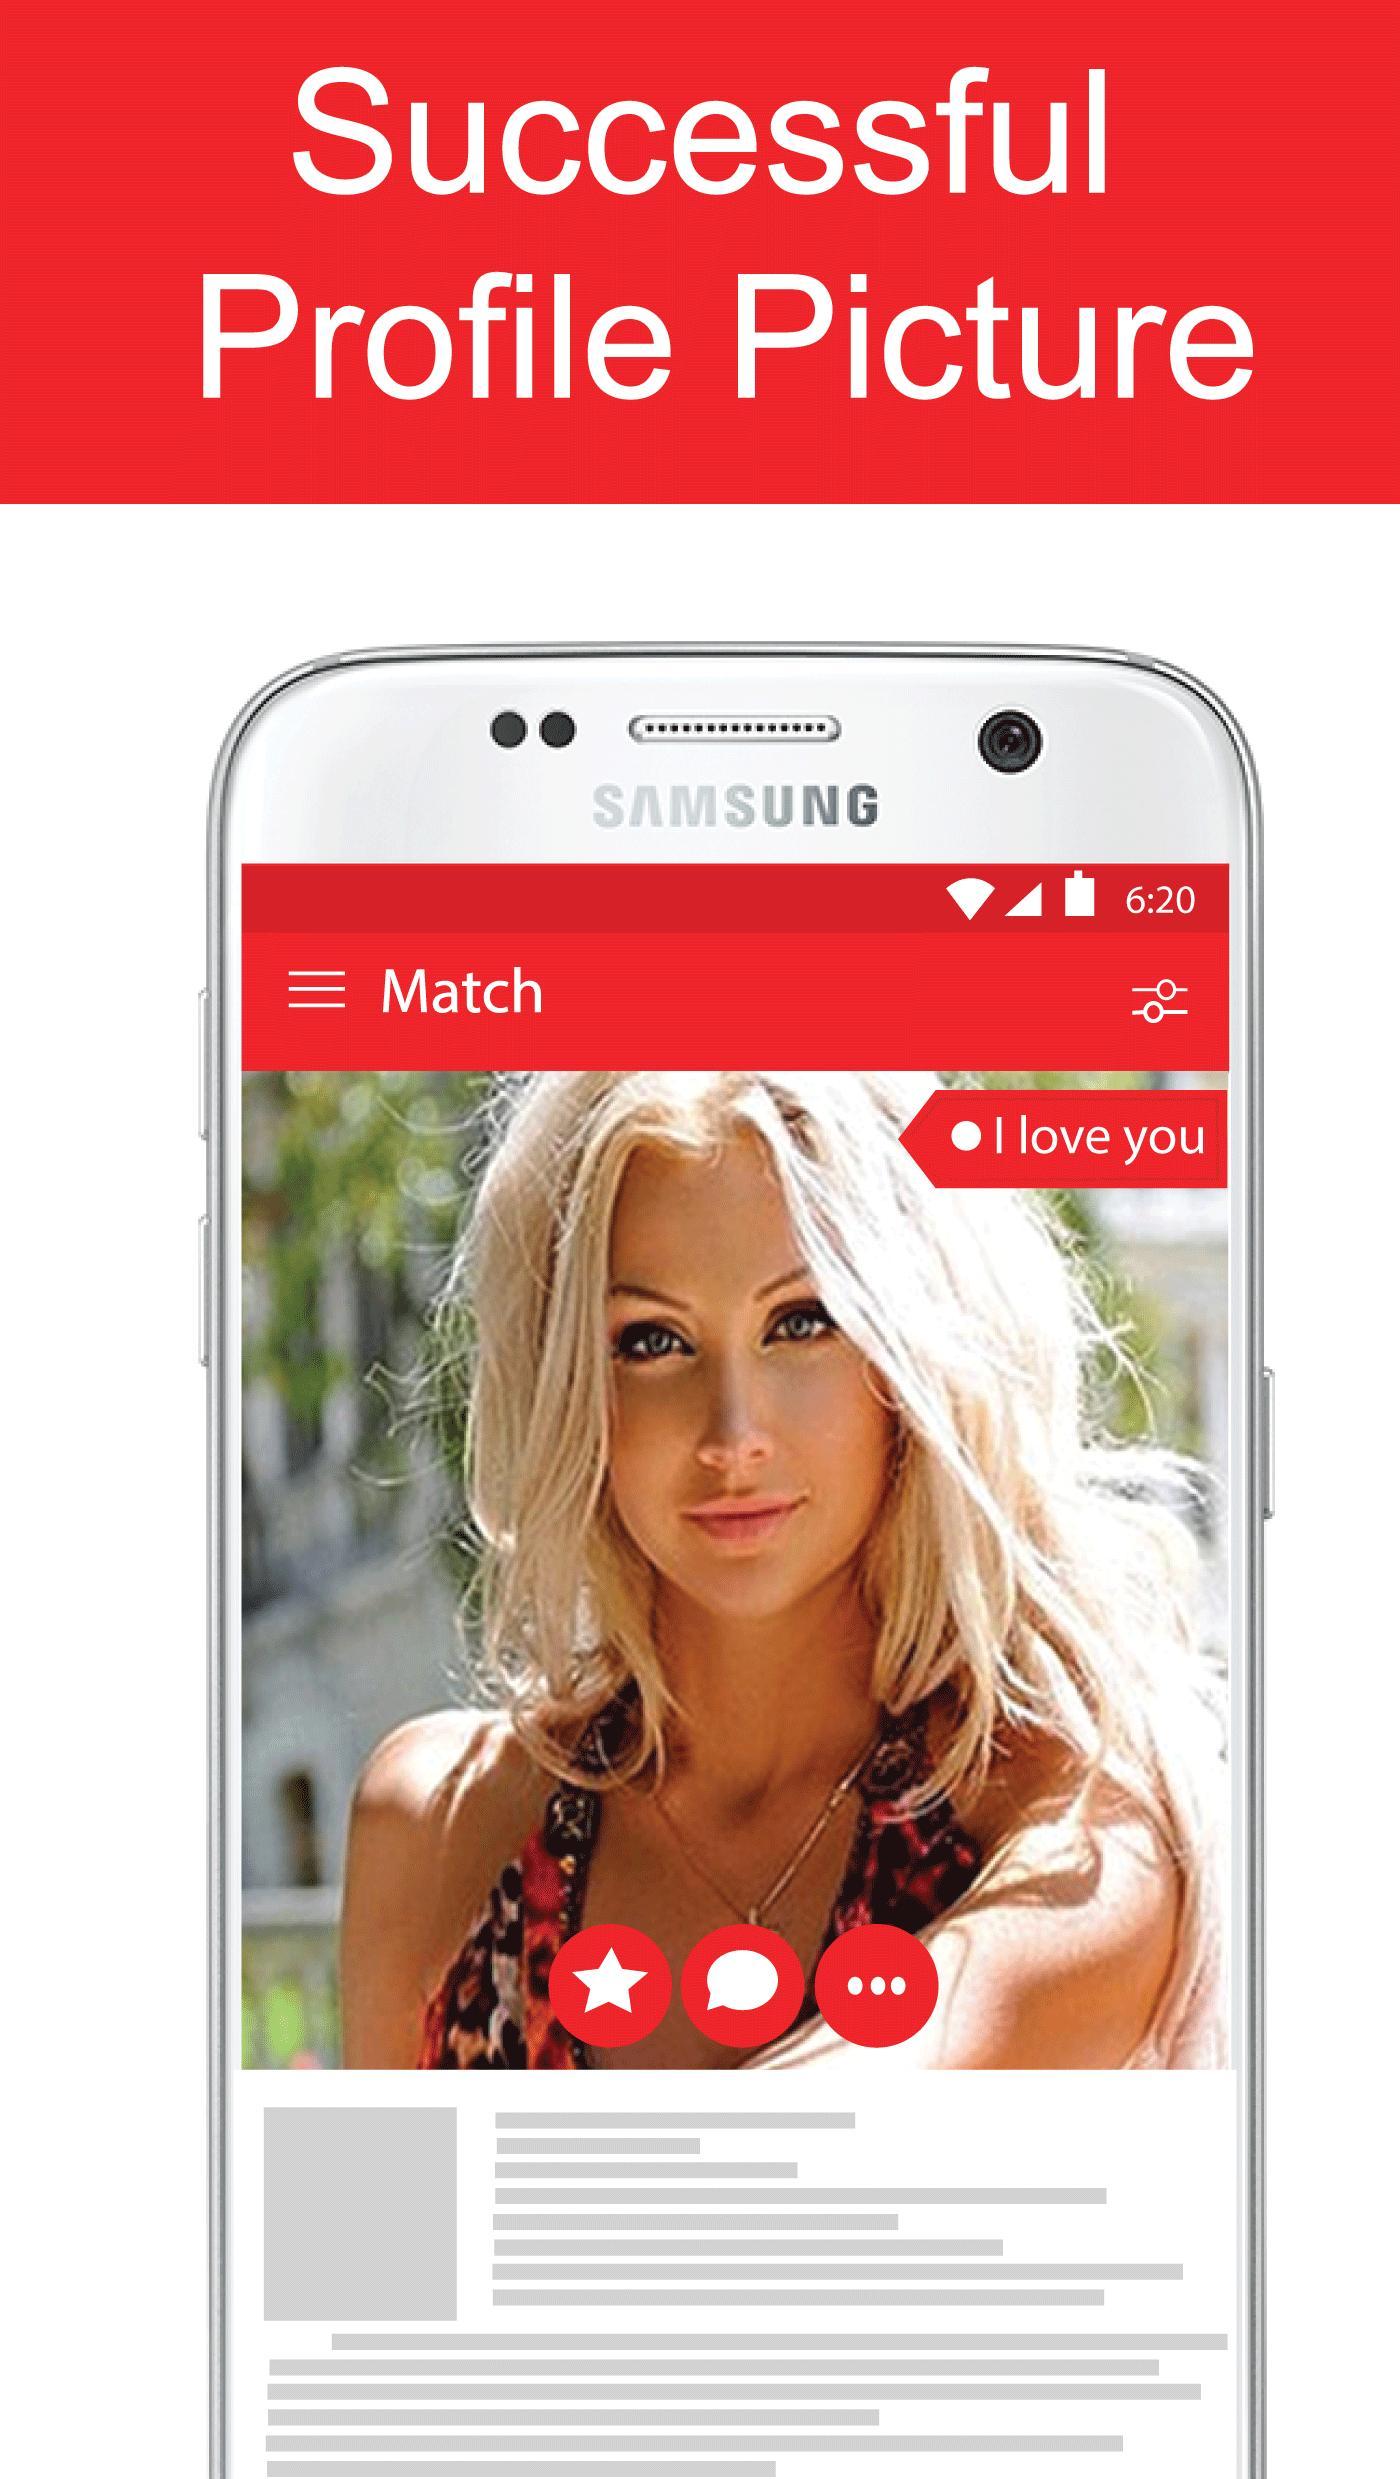 Presshearttofort-Dating